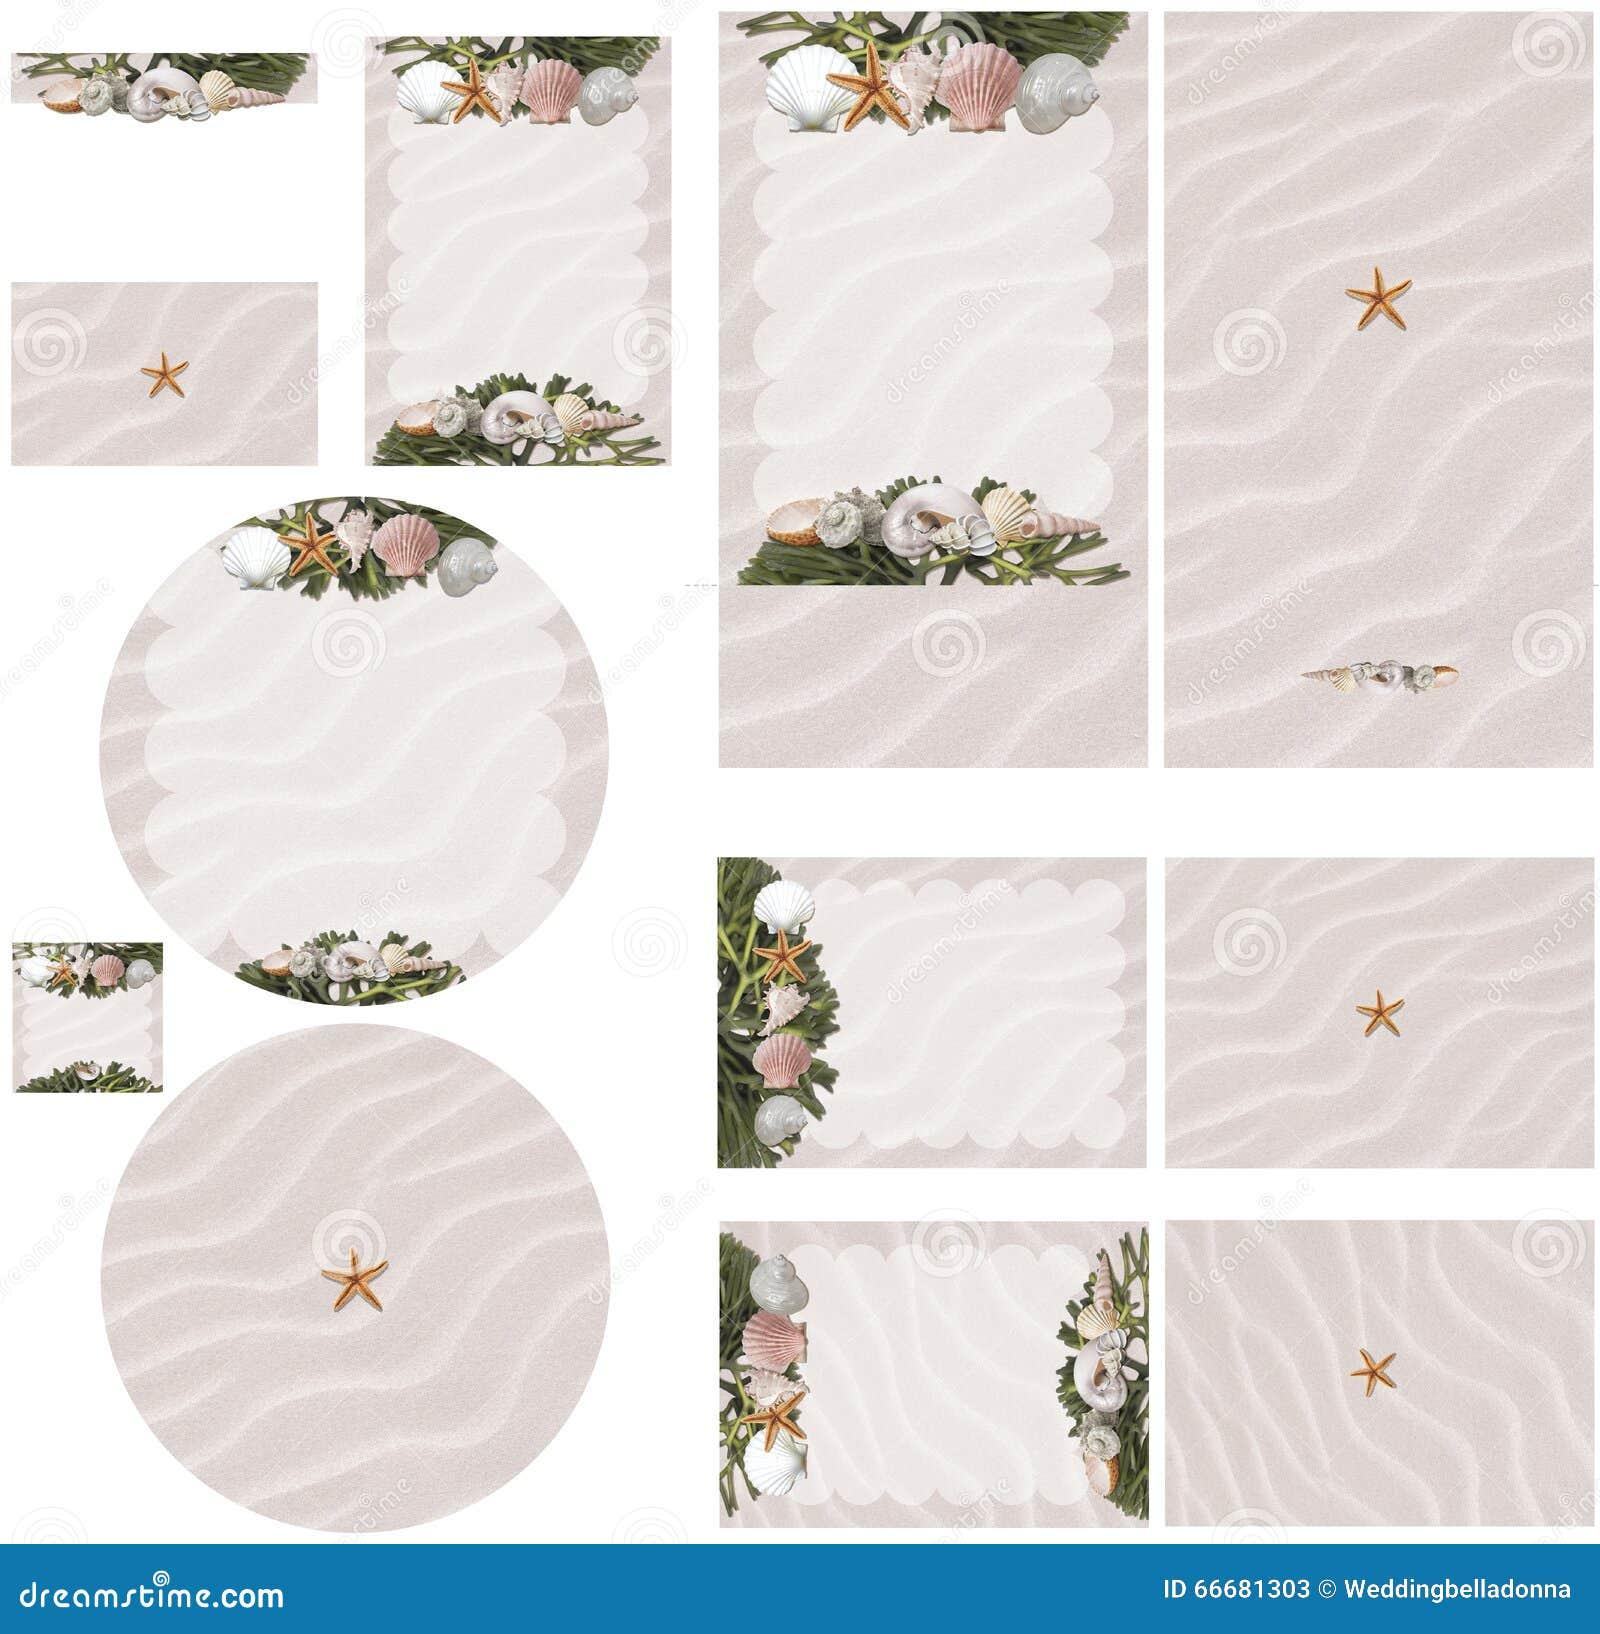 Beach Theme Card Stock: Beach Seashell And Seaweed Theme In Pink Sand Wedding